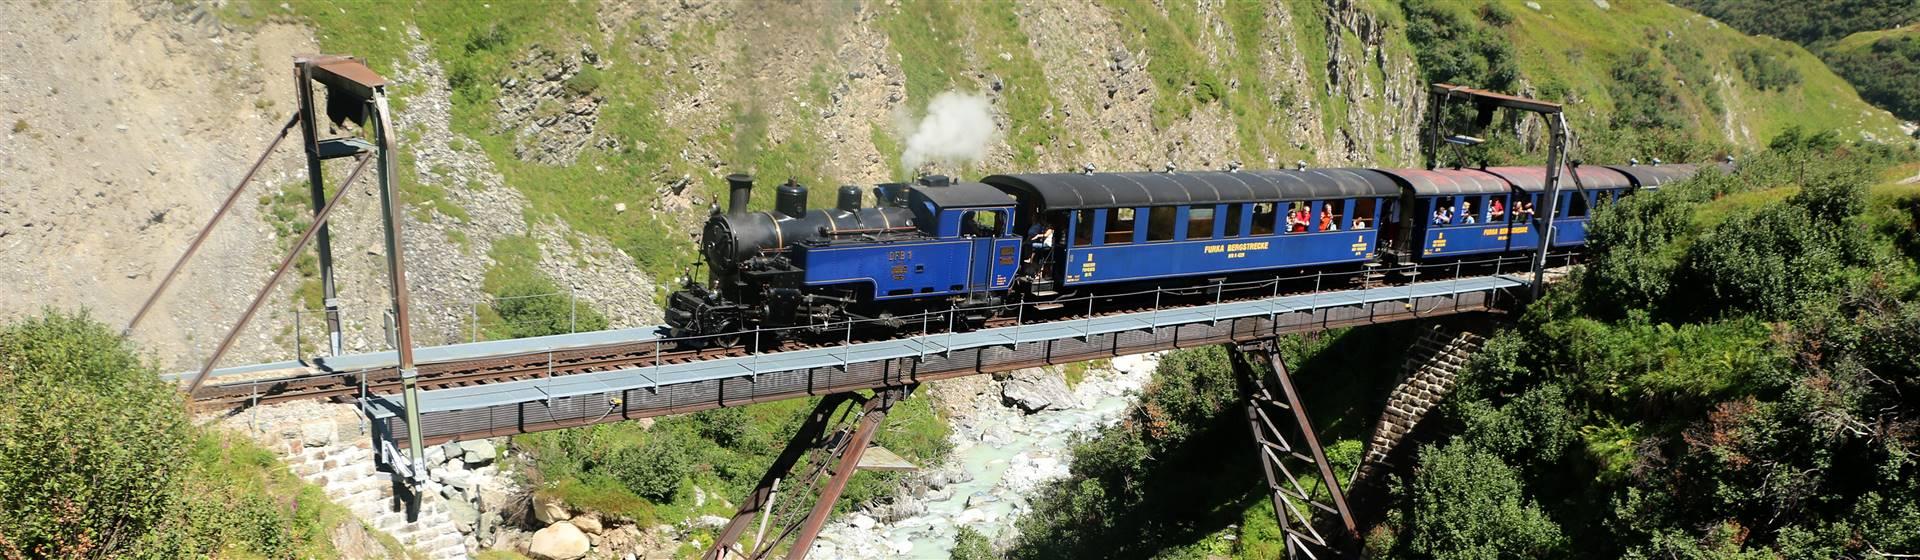 "<img src=""furkasteamrailway©dfb7_moser_1329.jpeg"" alt=""Furka Steam Railway""/>"